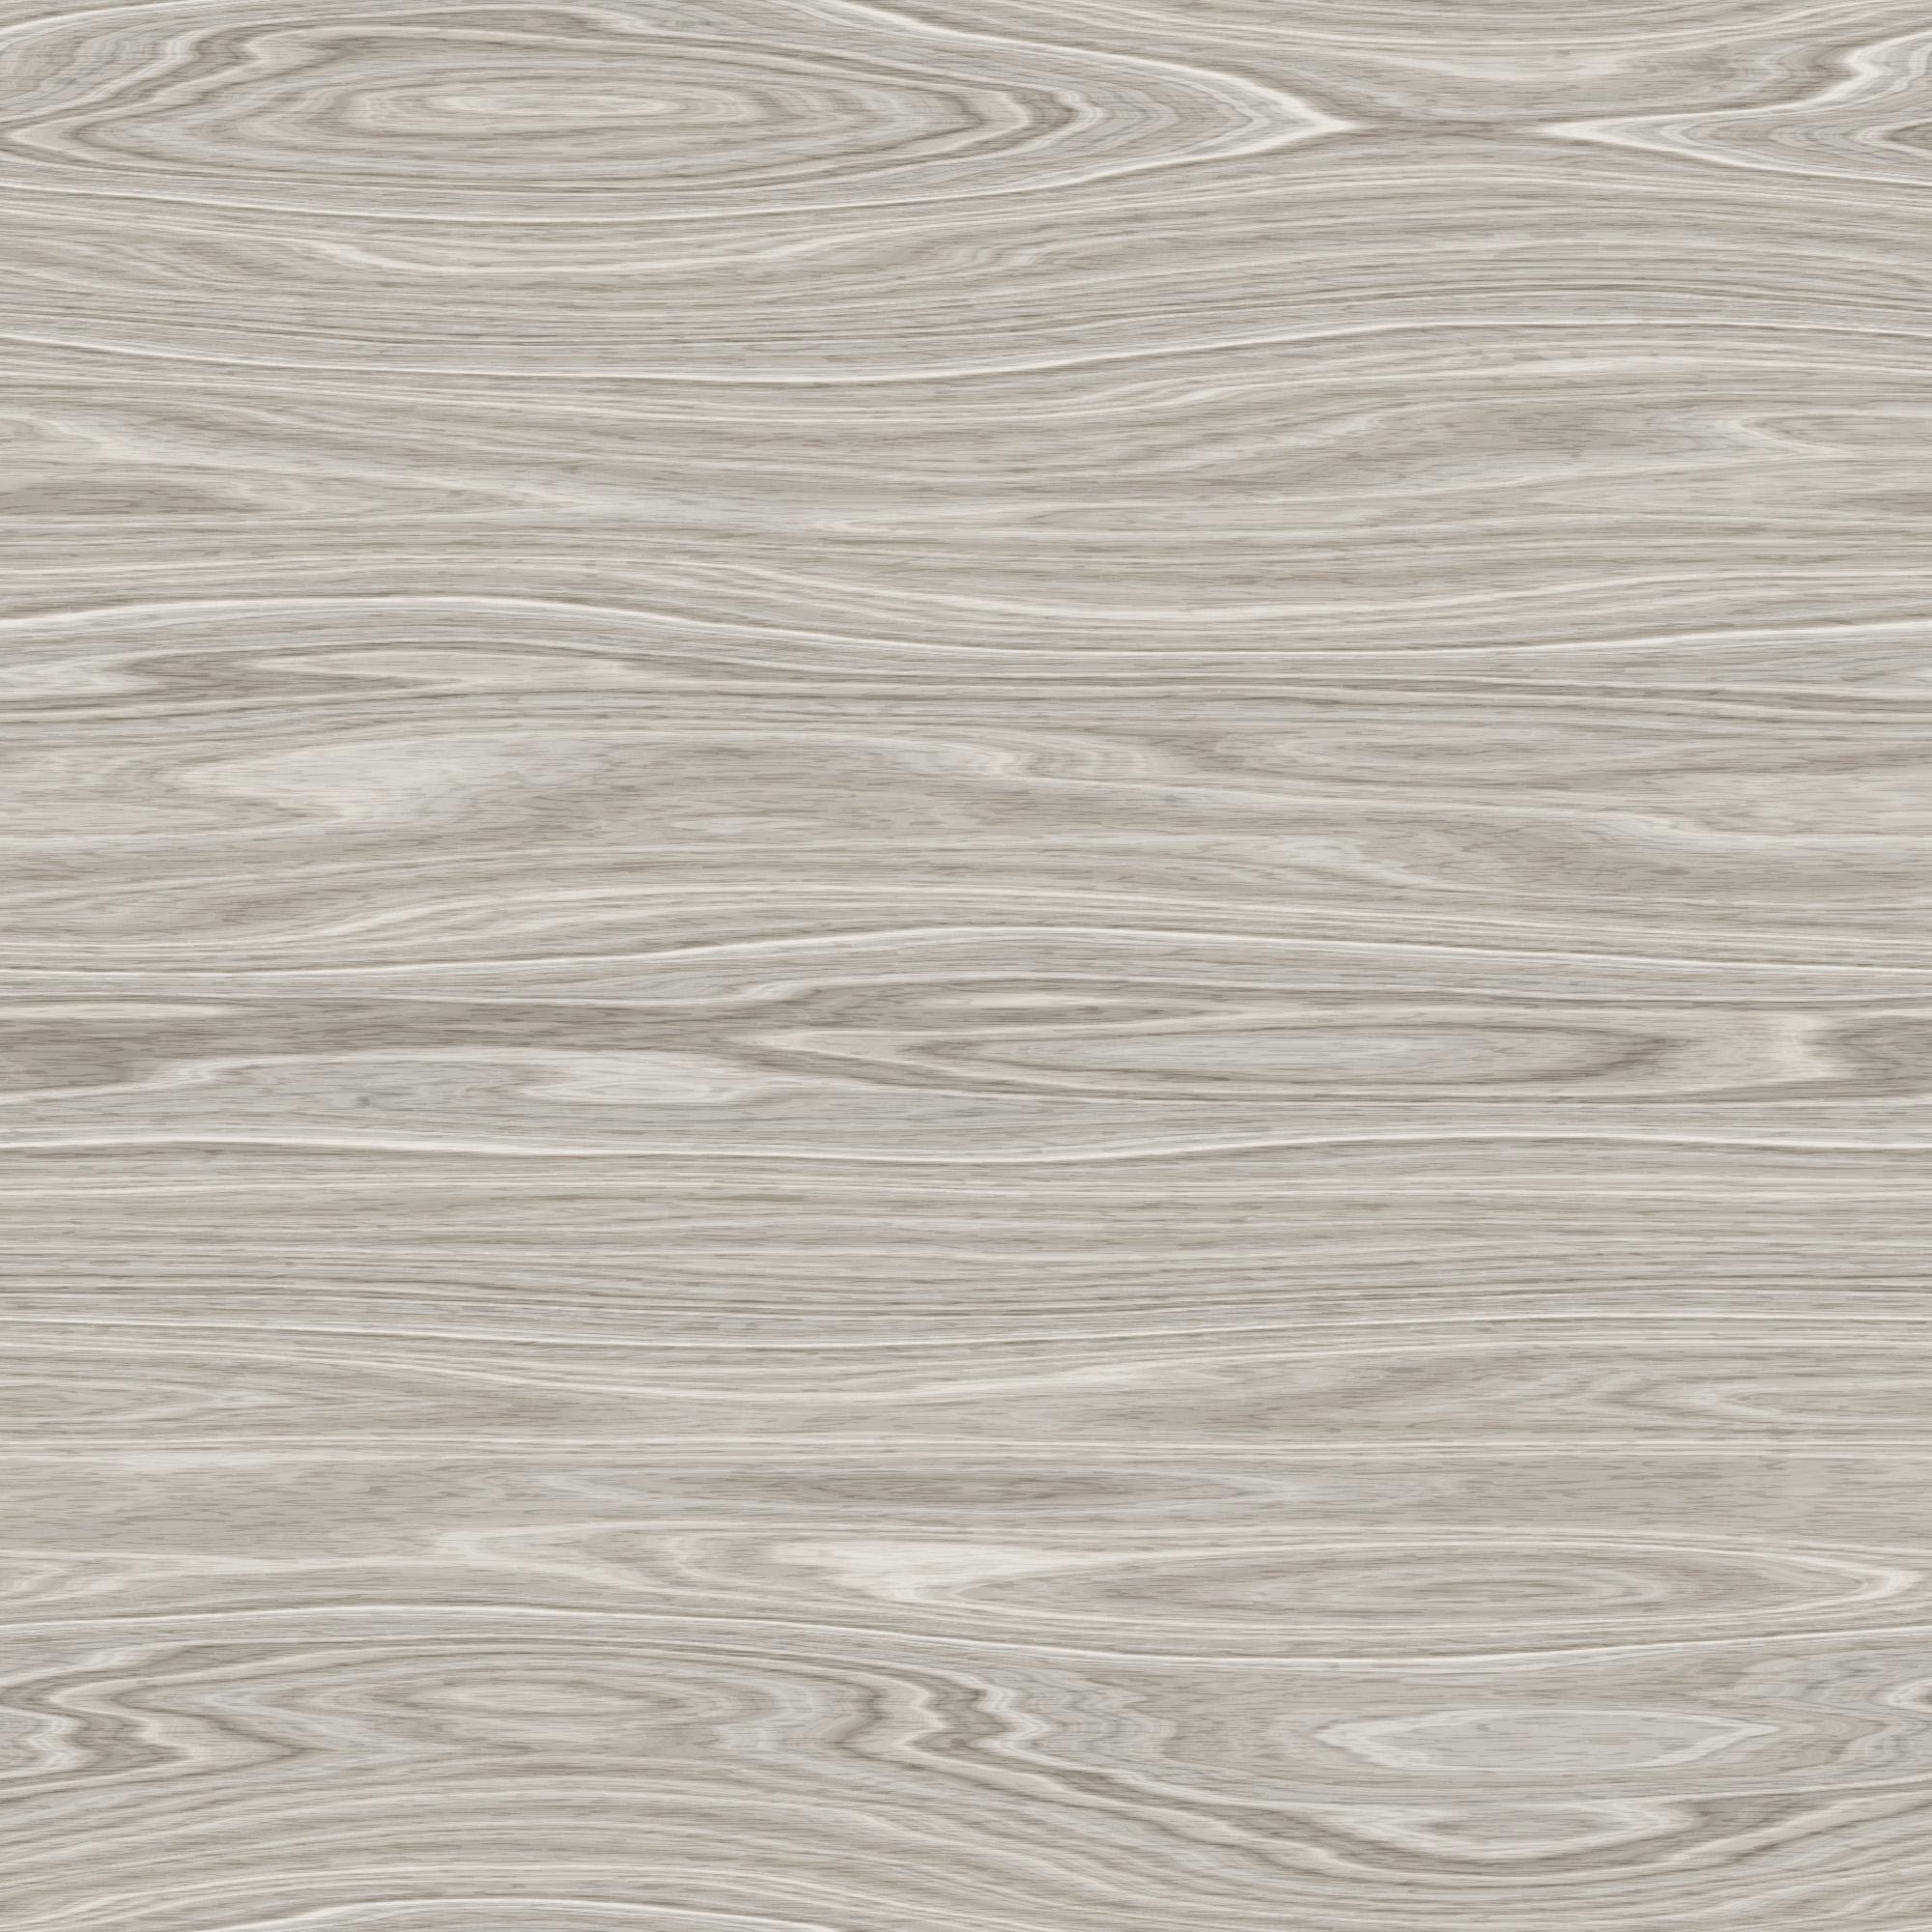 Pastel Purple Pink Green Blue Timber Wood Look: Wood Texture – Seamless Green / Gray Woodgrain